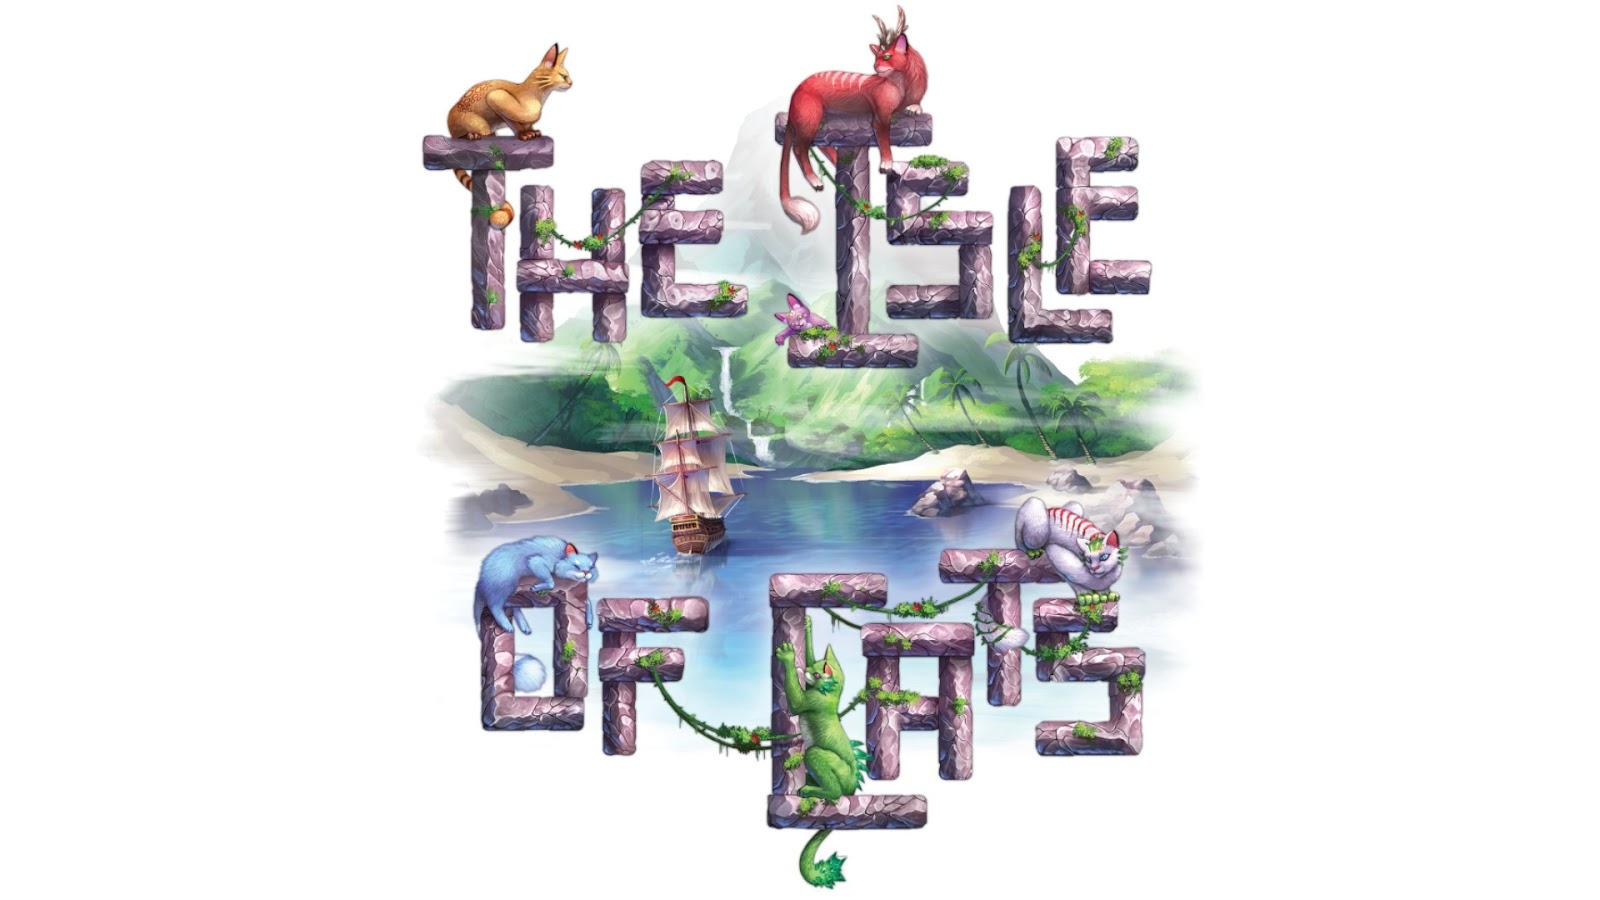 Kickstarter Highlights - Isle of Cats